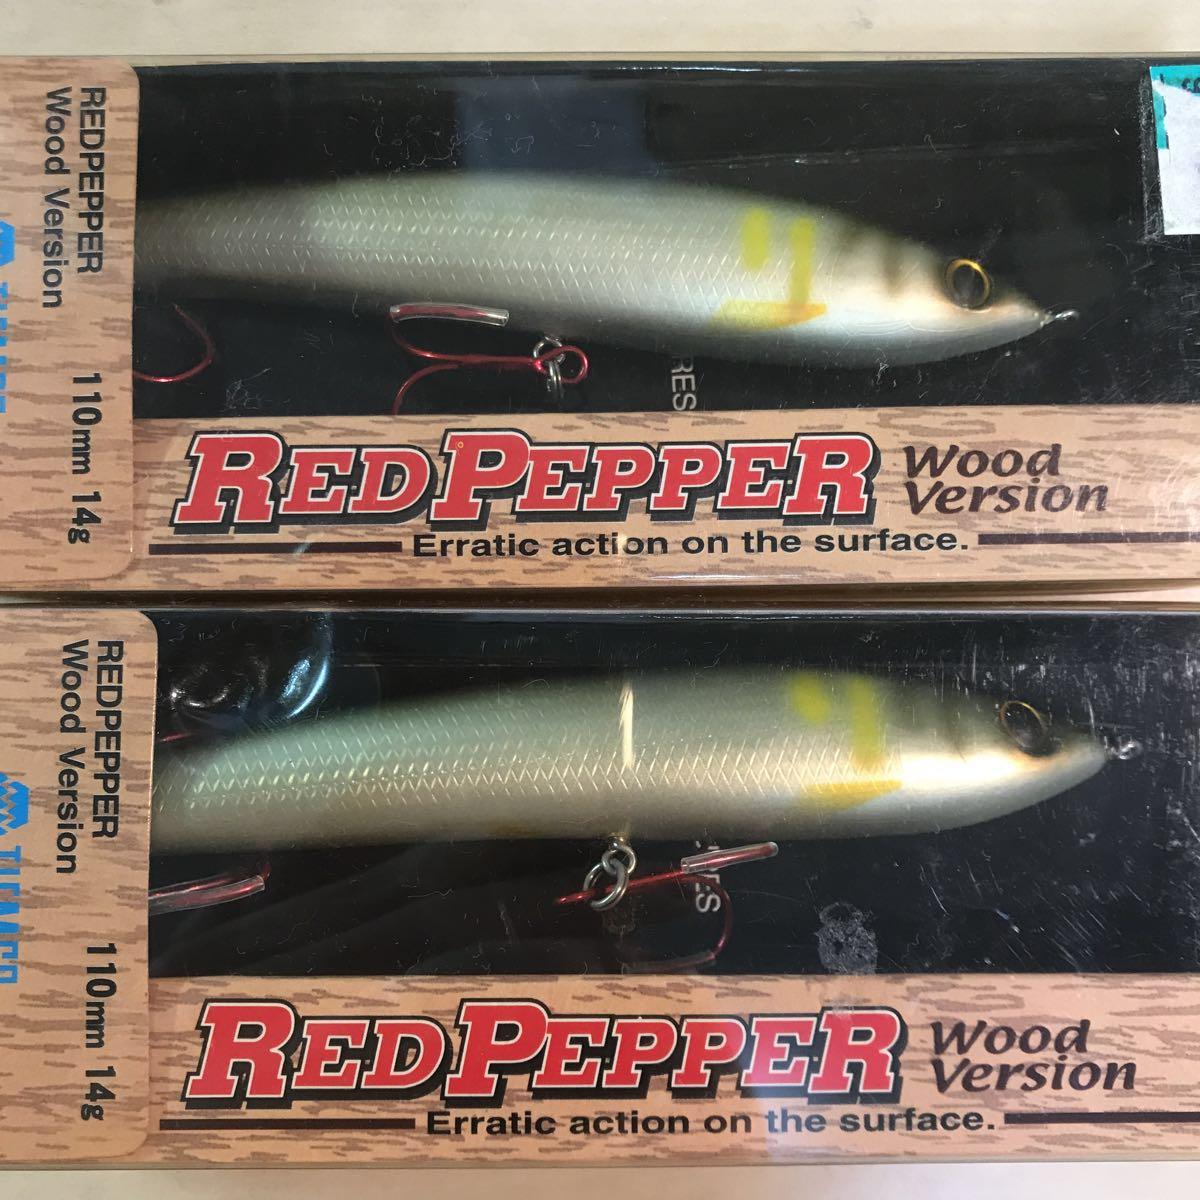 REDPEPPER Wood Version TIEMCO 110mm 14g レッドペッパー ウッドバージョン ティムコ デッドストック 新品未使用_画像4